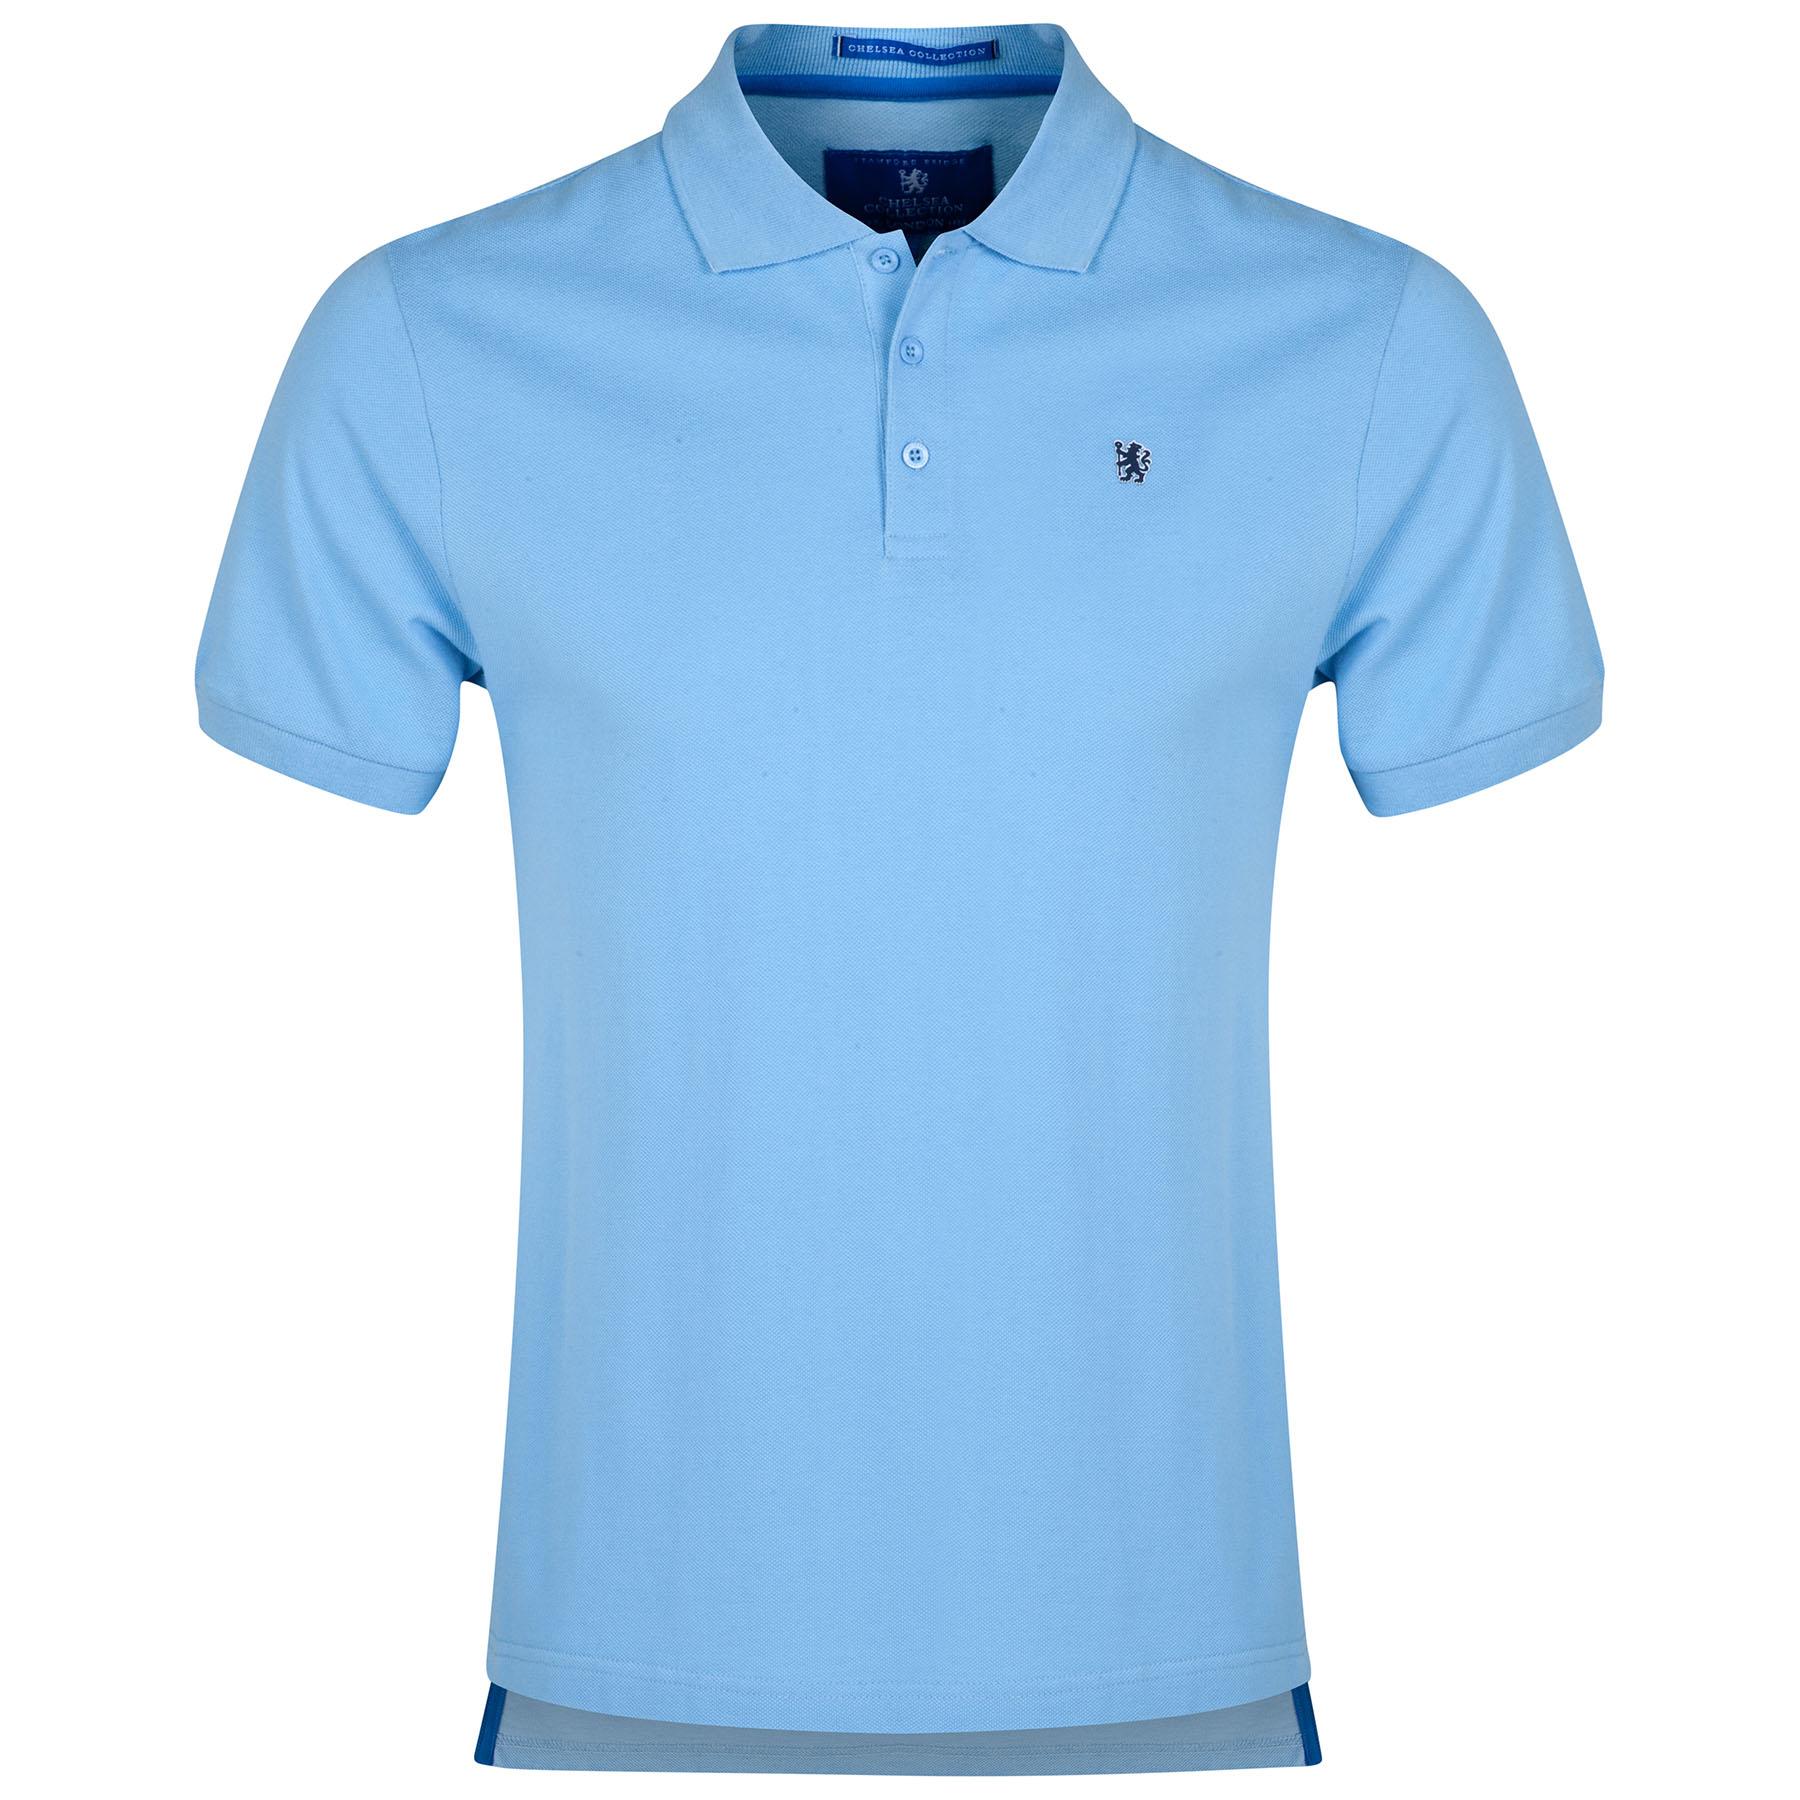 Chelsea Lion Polo Shirt - Sky Blue - Mens